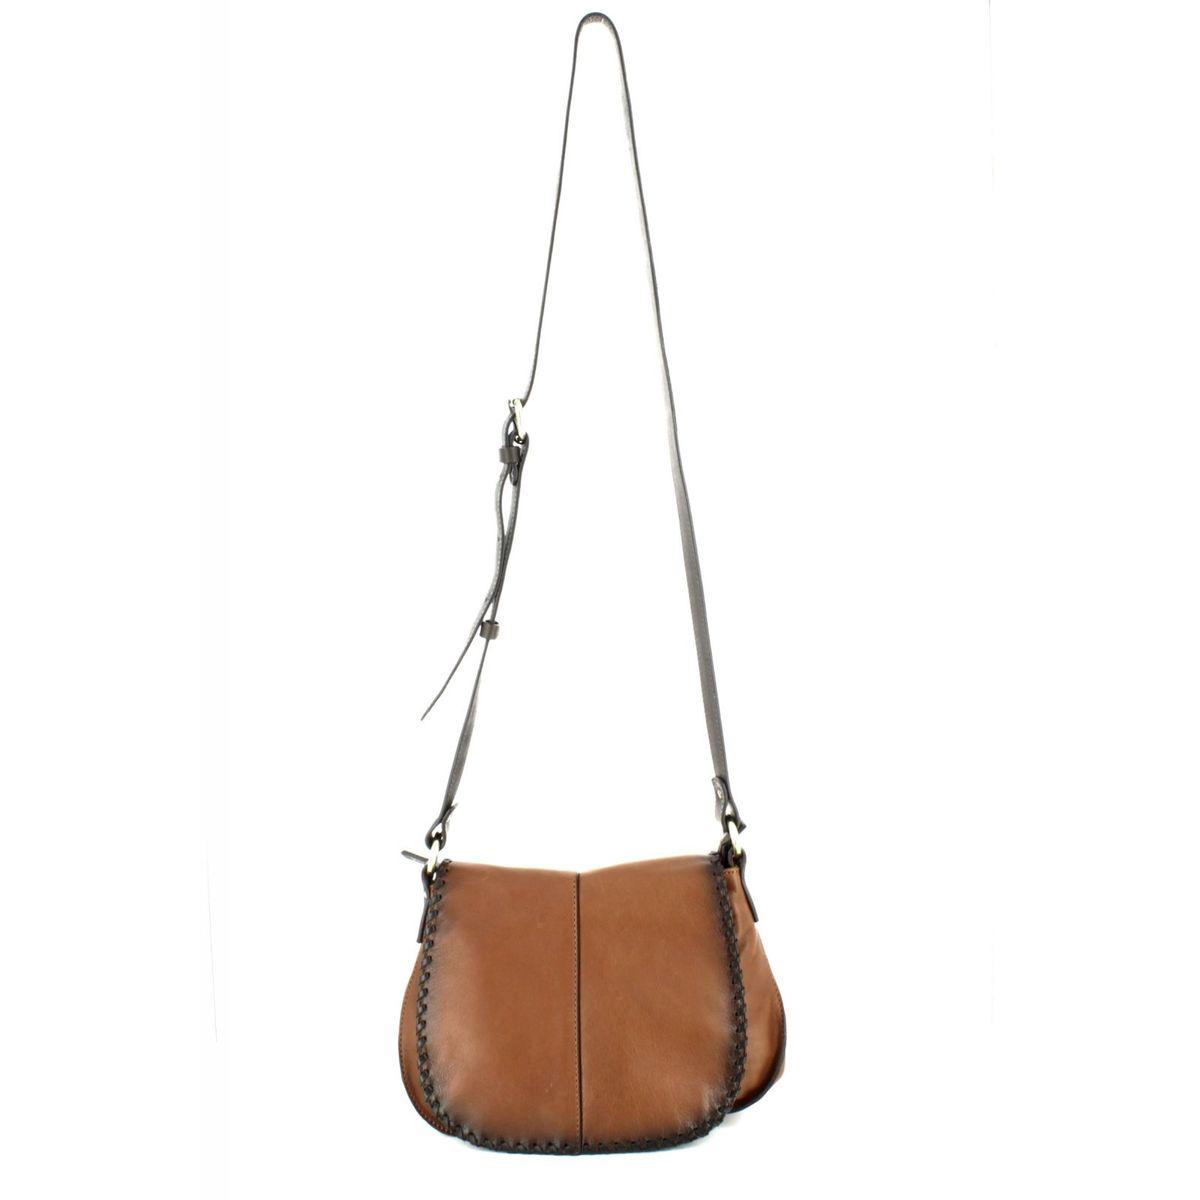 Gianni Conti Handbag Tan 1483741 21 Whip Sch